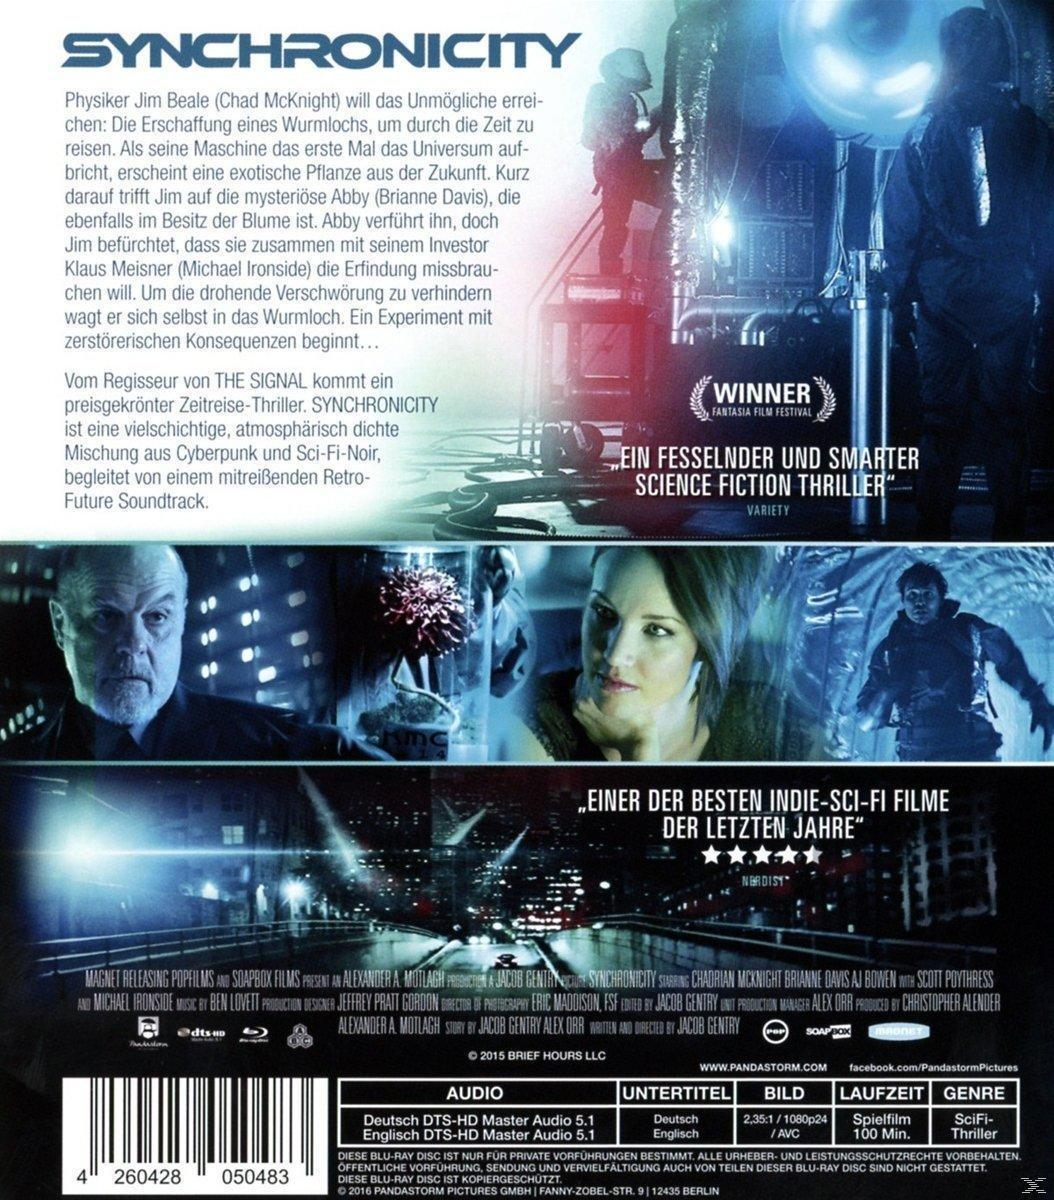 Synchronicity (BLU-RAY) für 12,99 Euro